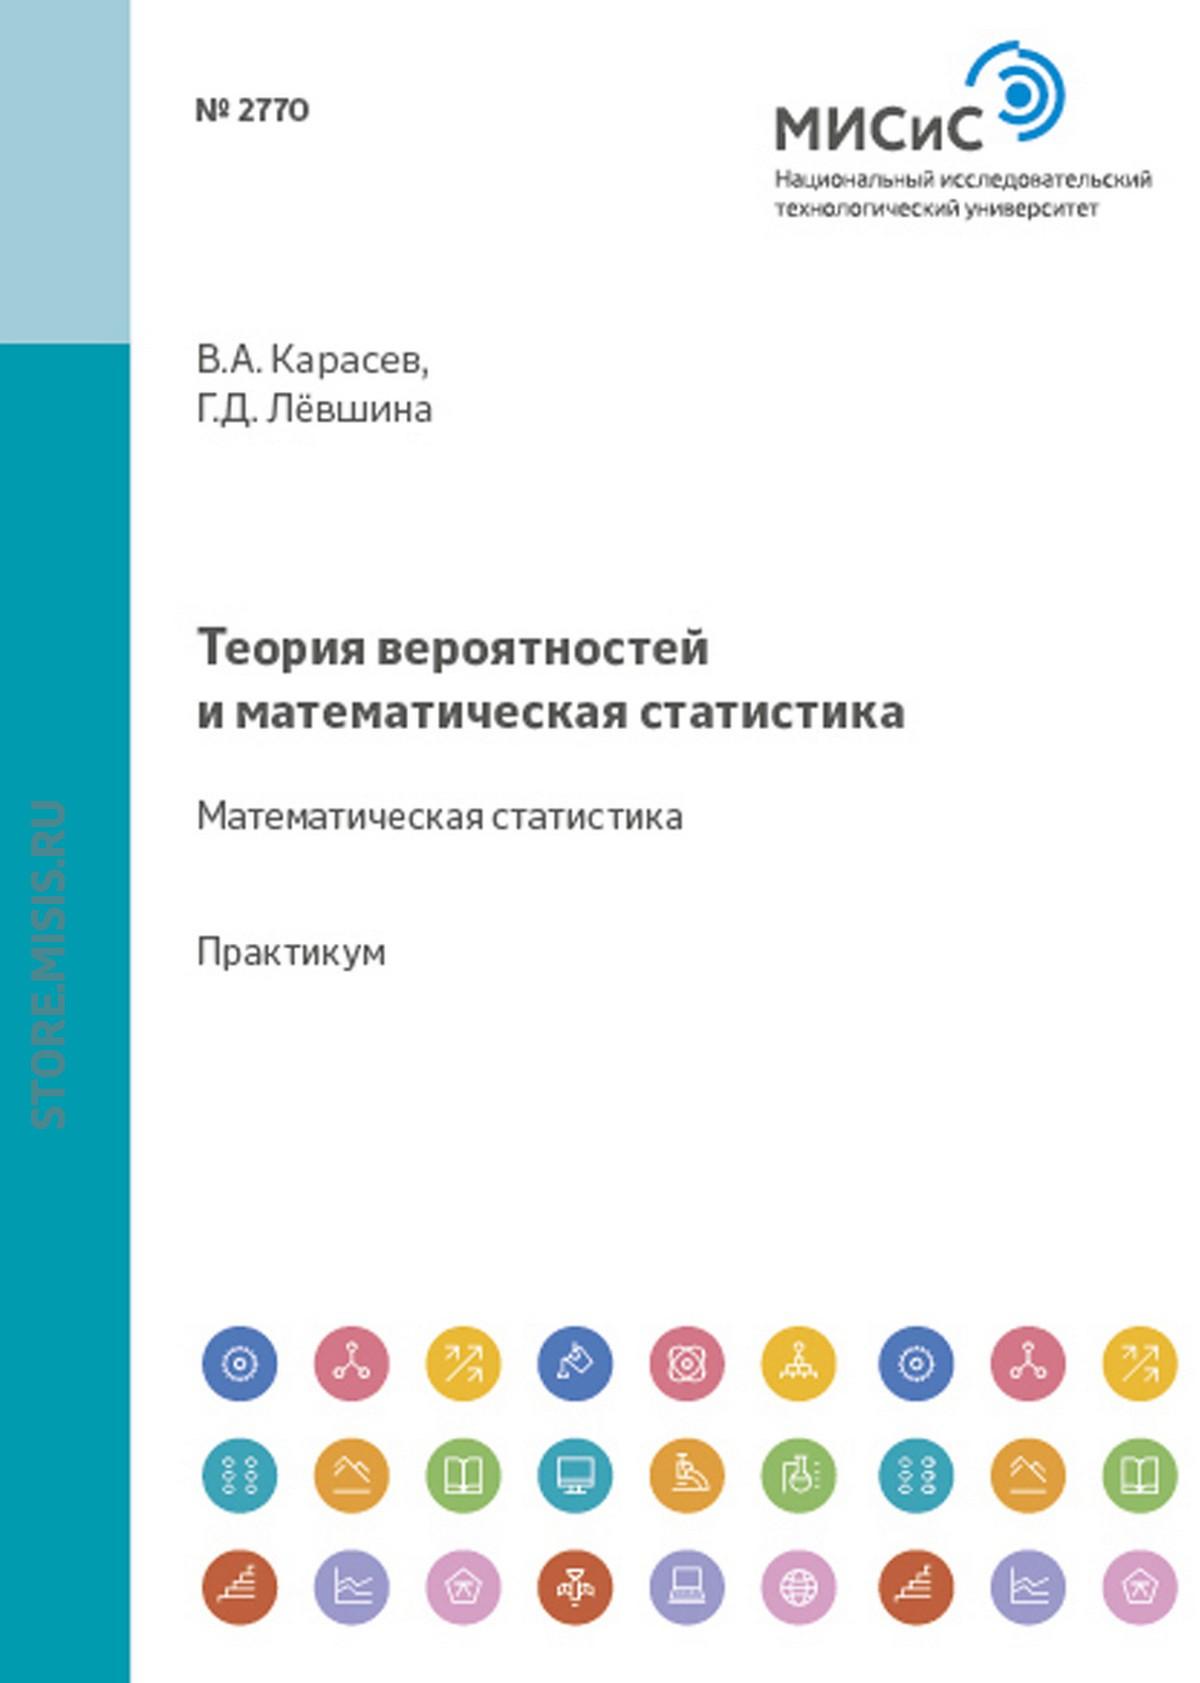 В. А. Карасев Теория вероятностей и математическая статистика. Математическая статистика е р горяинова теория вероятностей и математическая статистика базовый курс с примерами и задачами